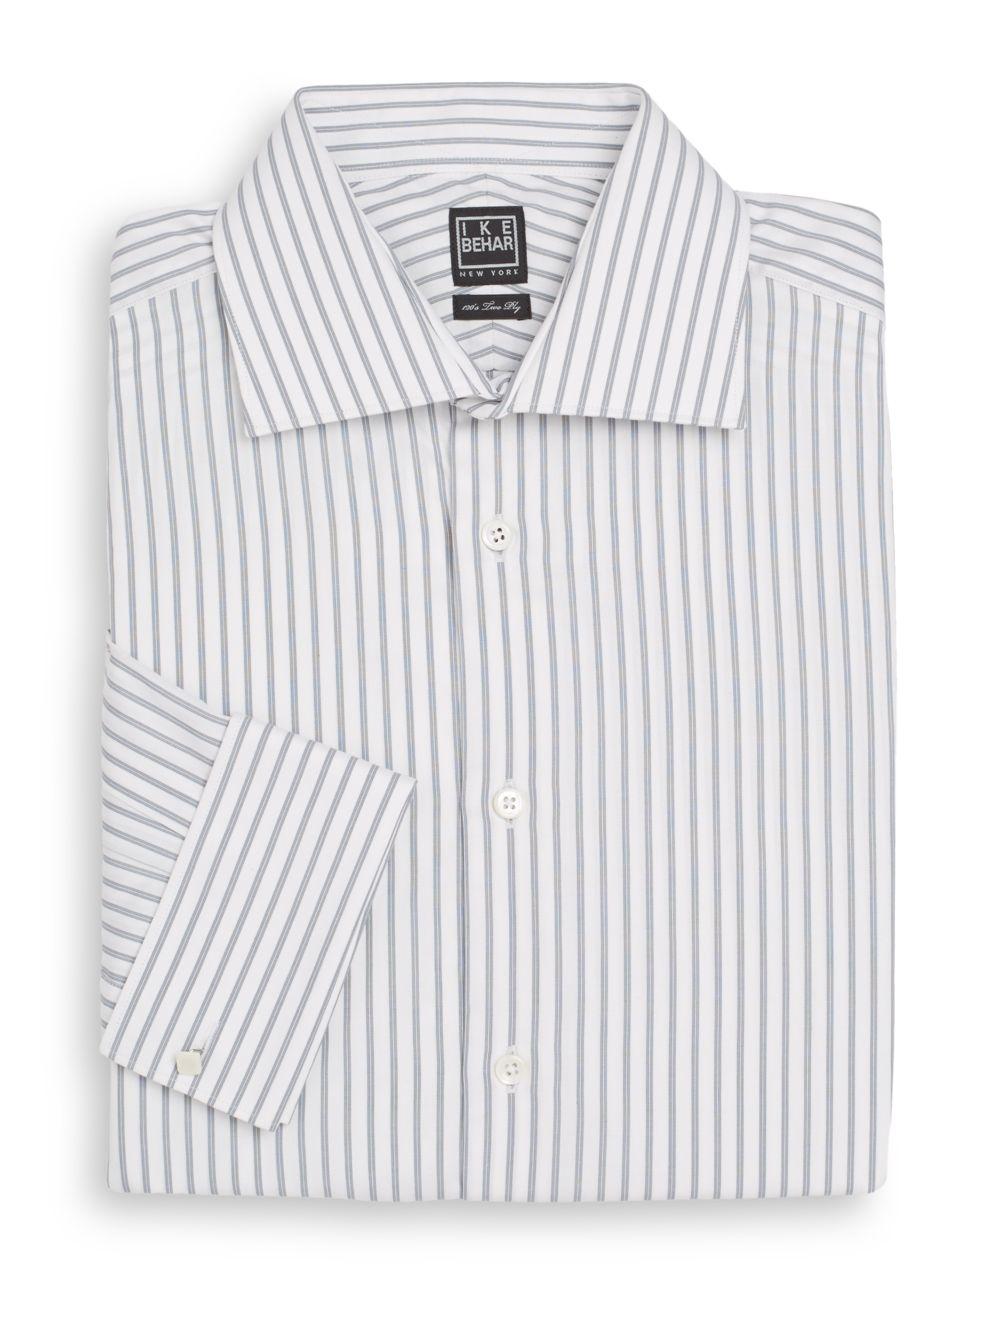 Ike behar herringbone stripe cotton dress shirt in white for White herringbone dress shirt